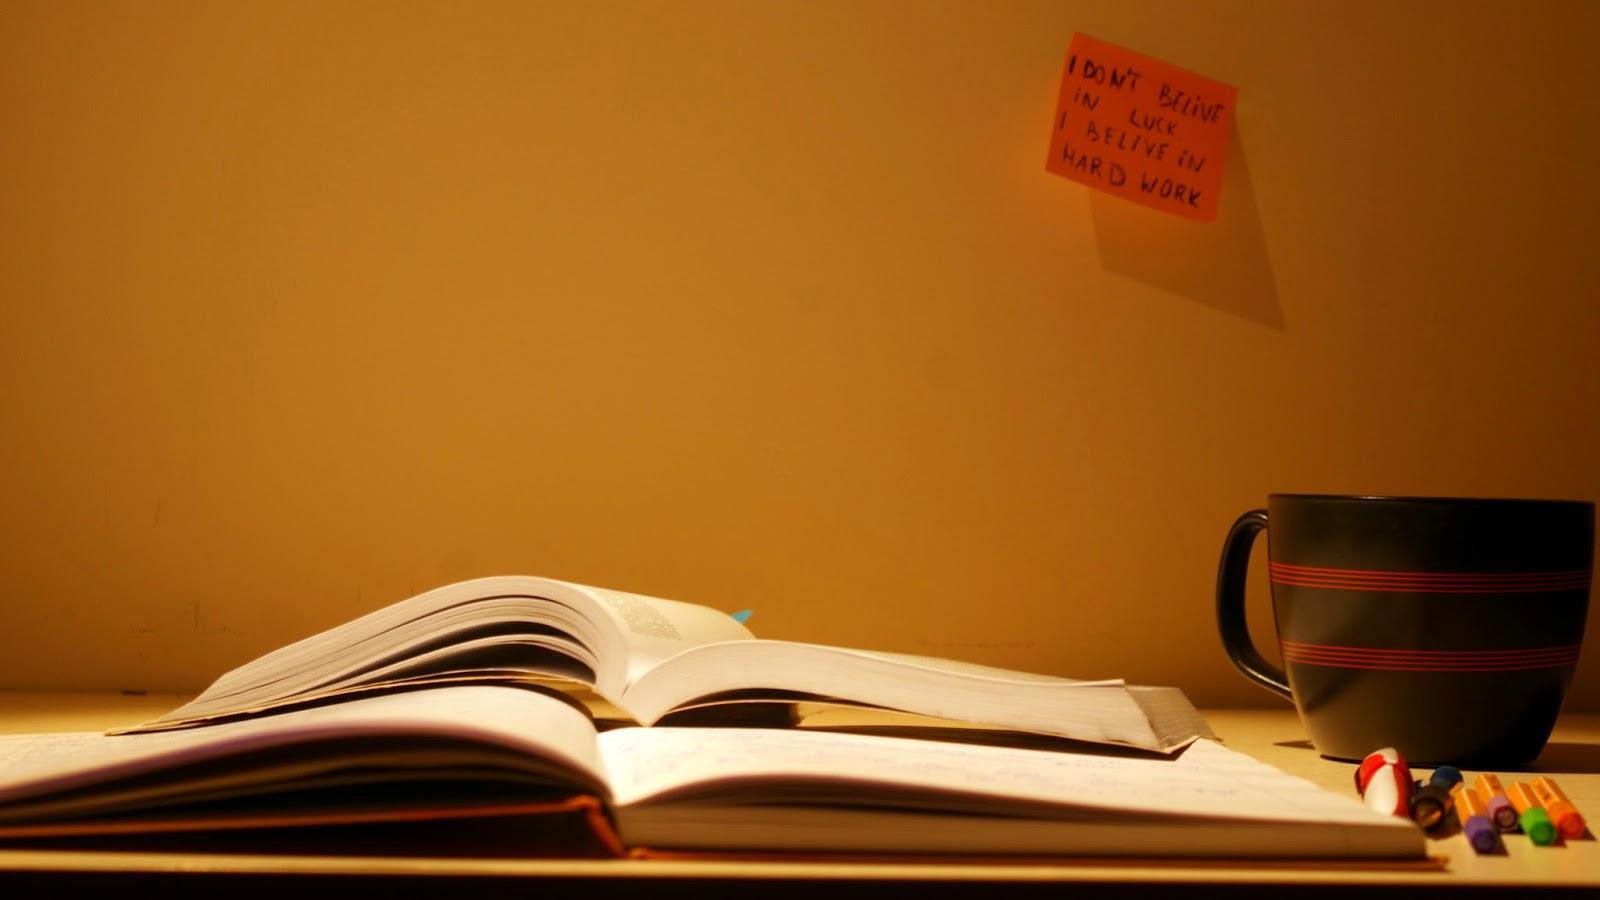 nauka koncentracja książki herbata